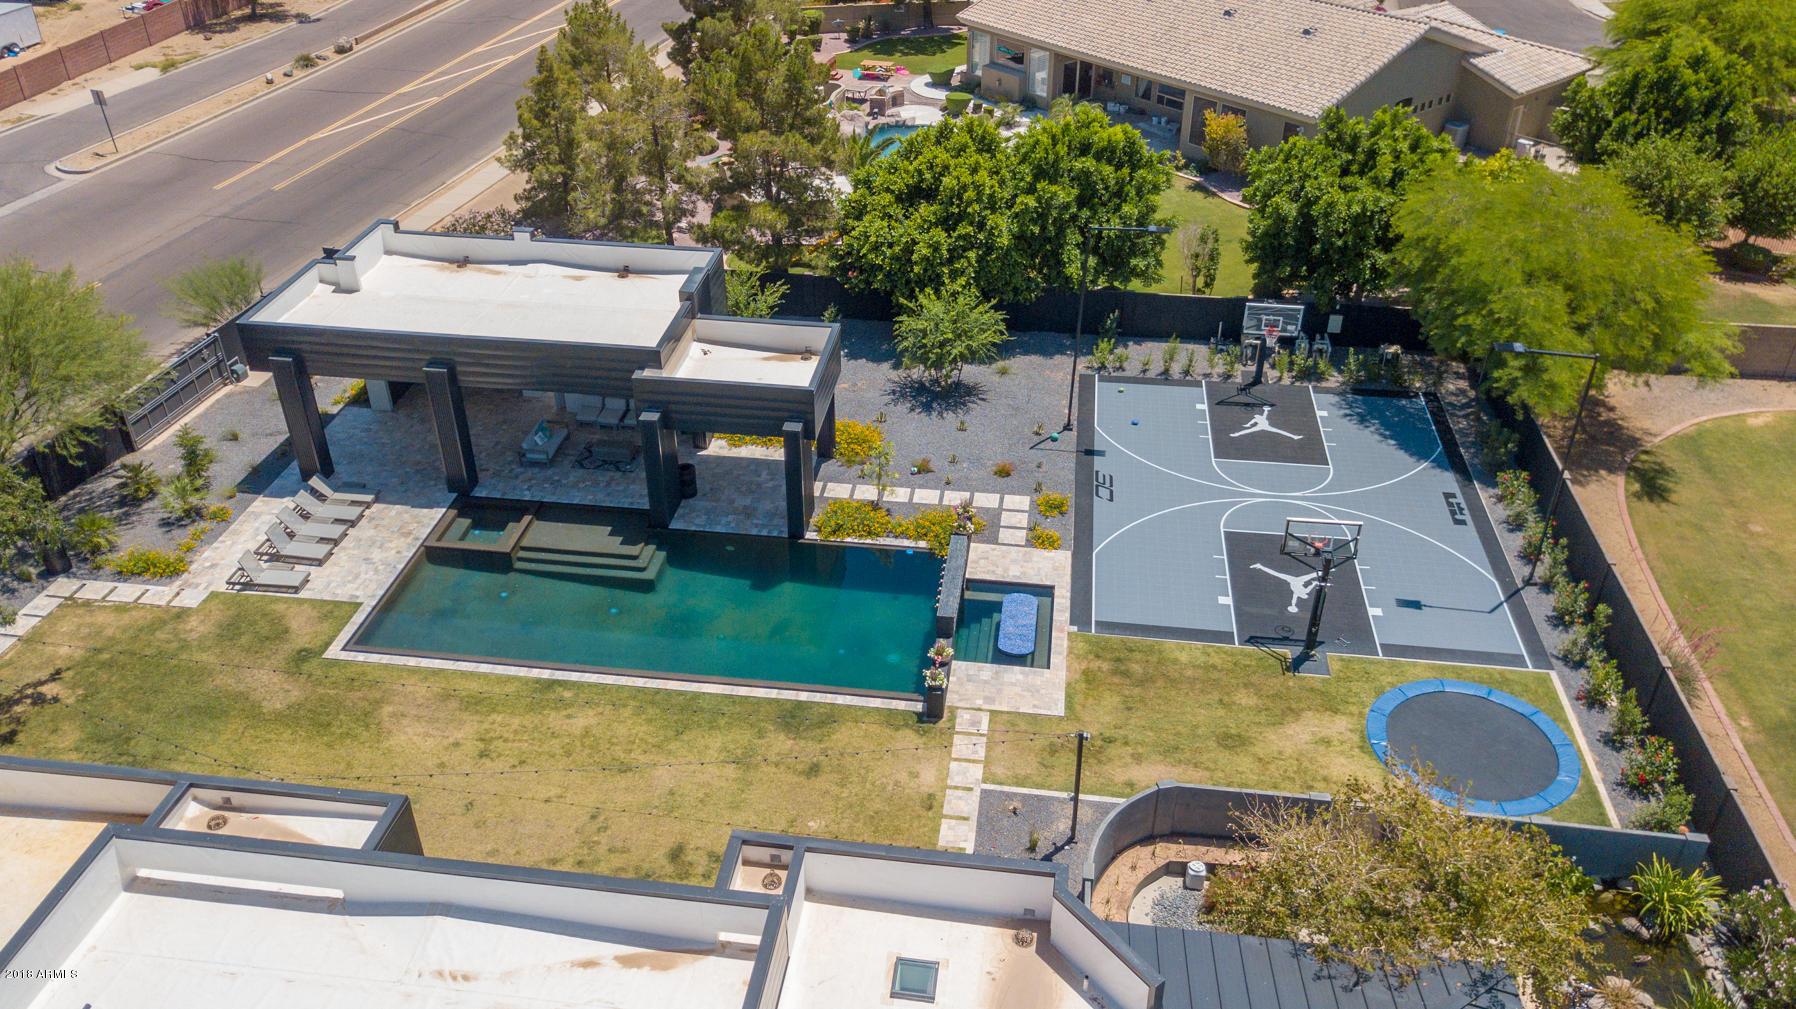 MLS 5781450 5509 W SOFT WIND Drive, Glendale, AZ 85310 Glendale AZ Private Pool